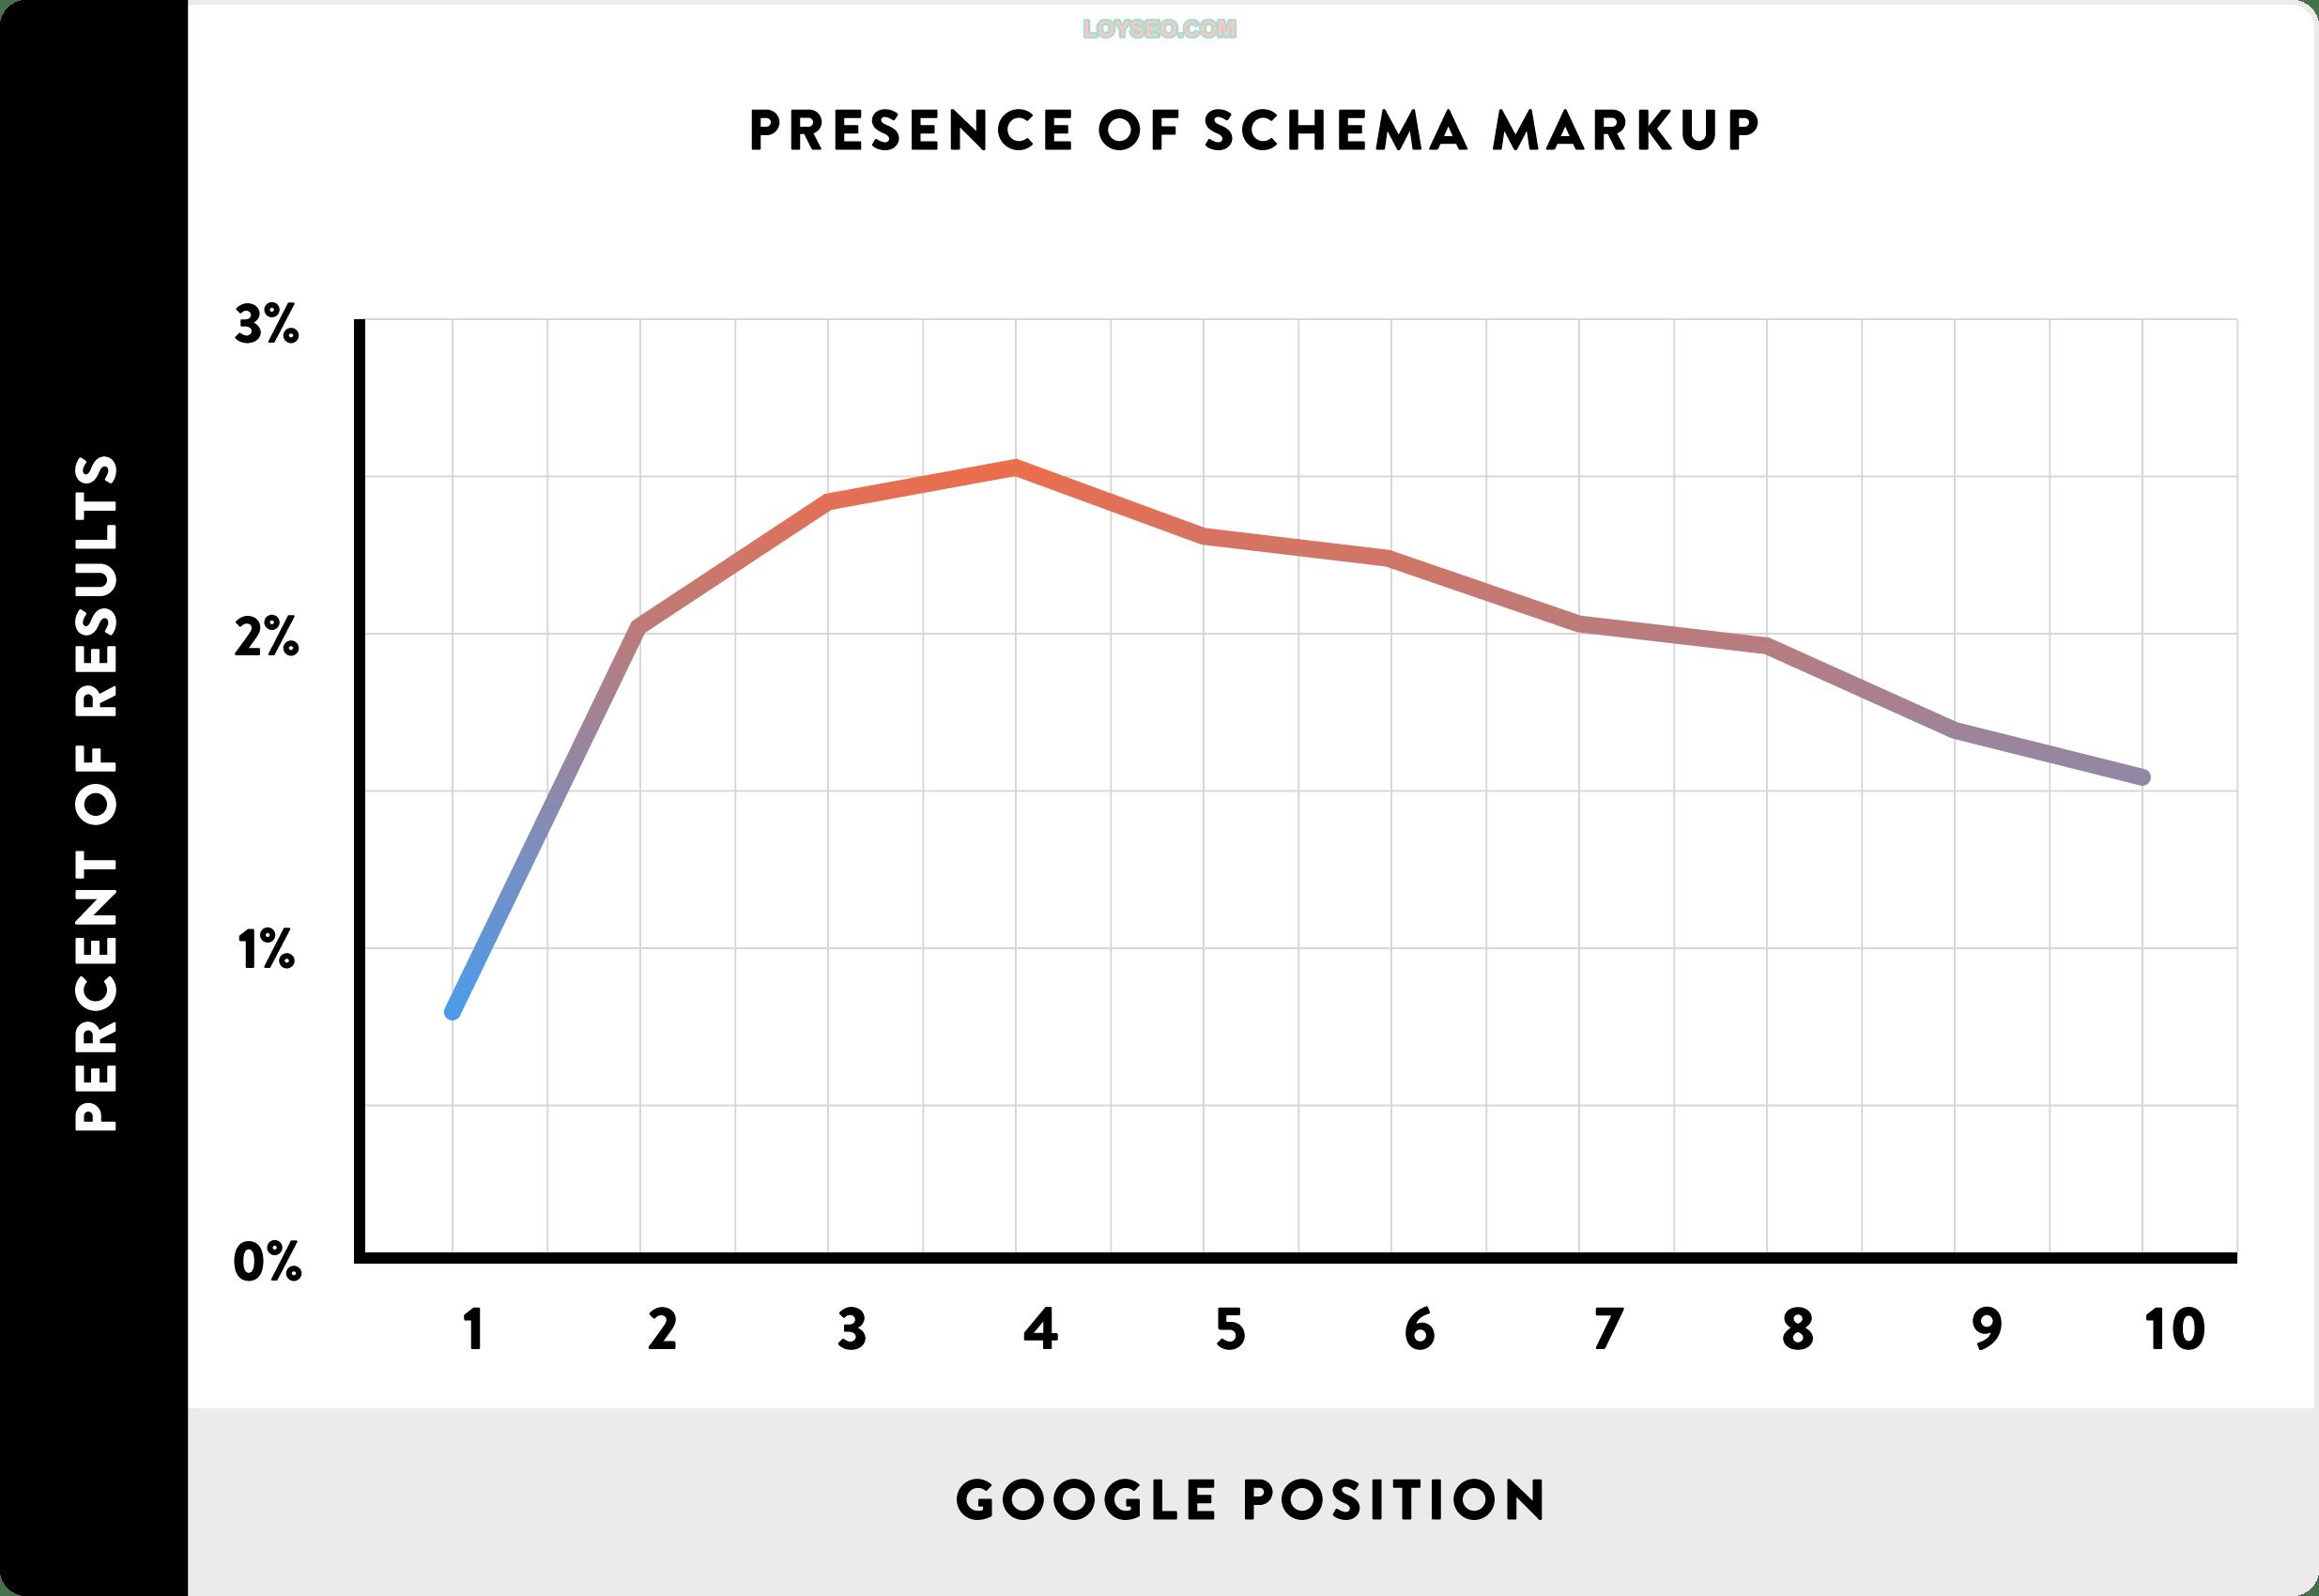 Presence of Schema markup